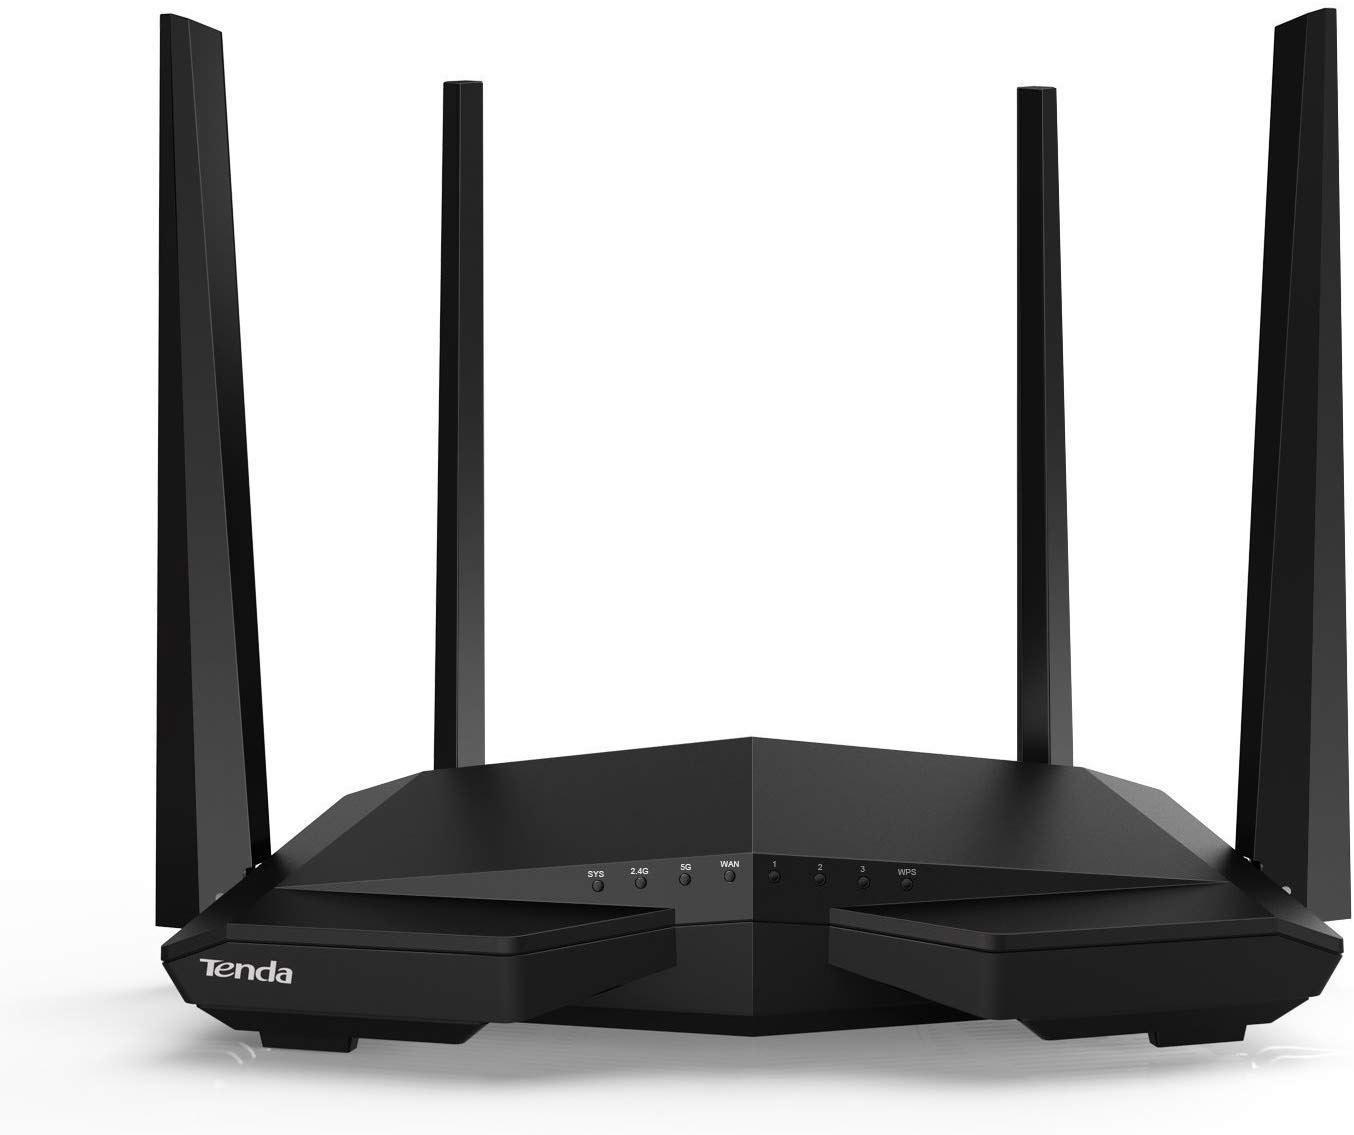 Tenda AC6 router